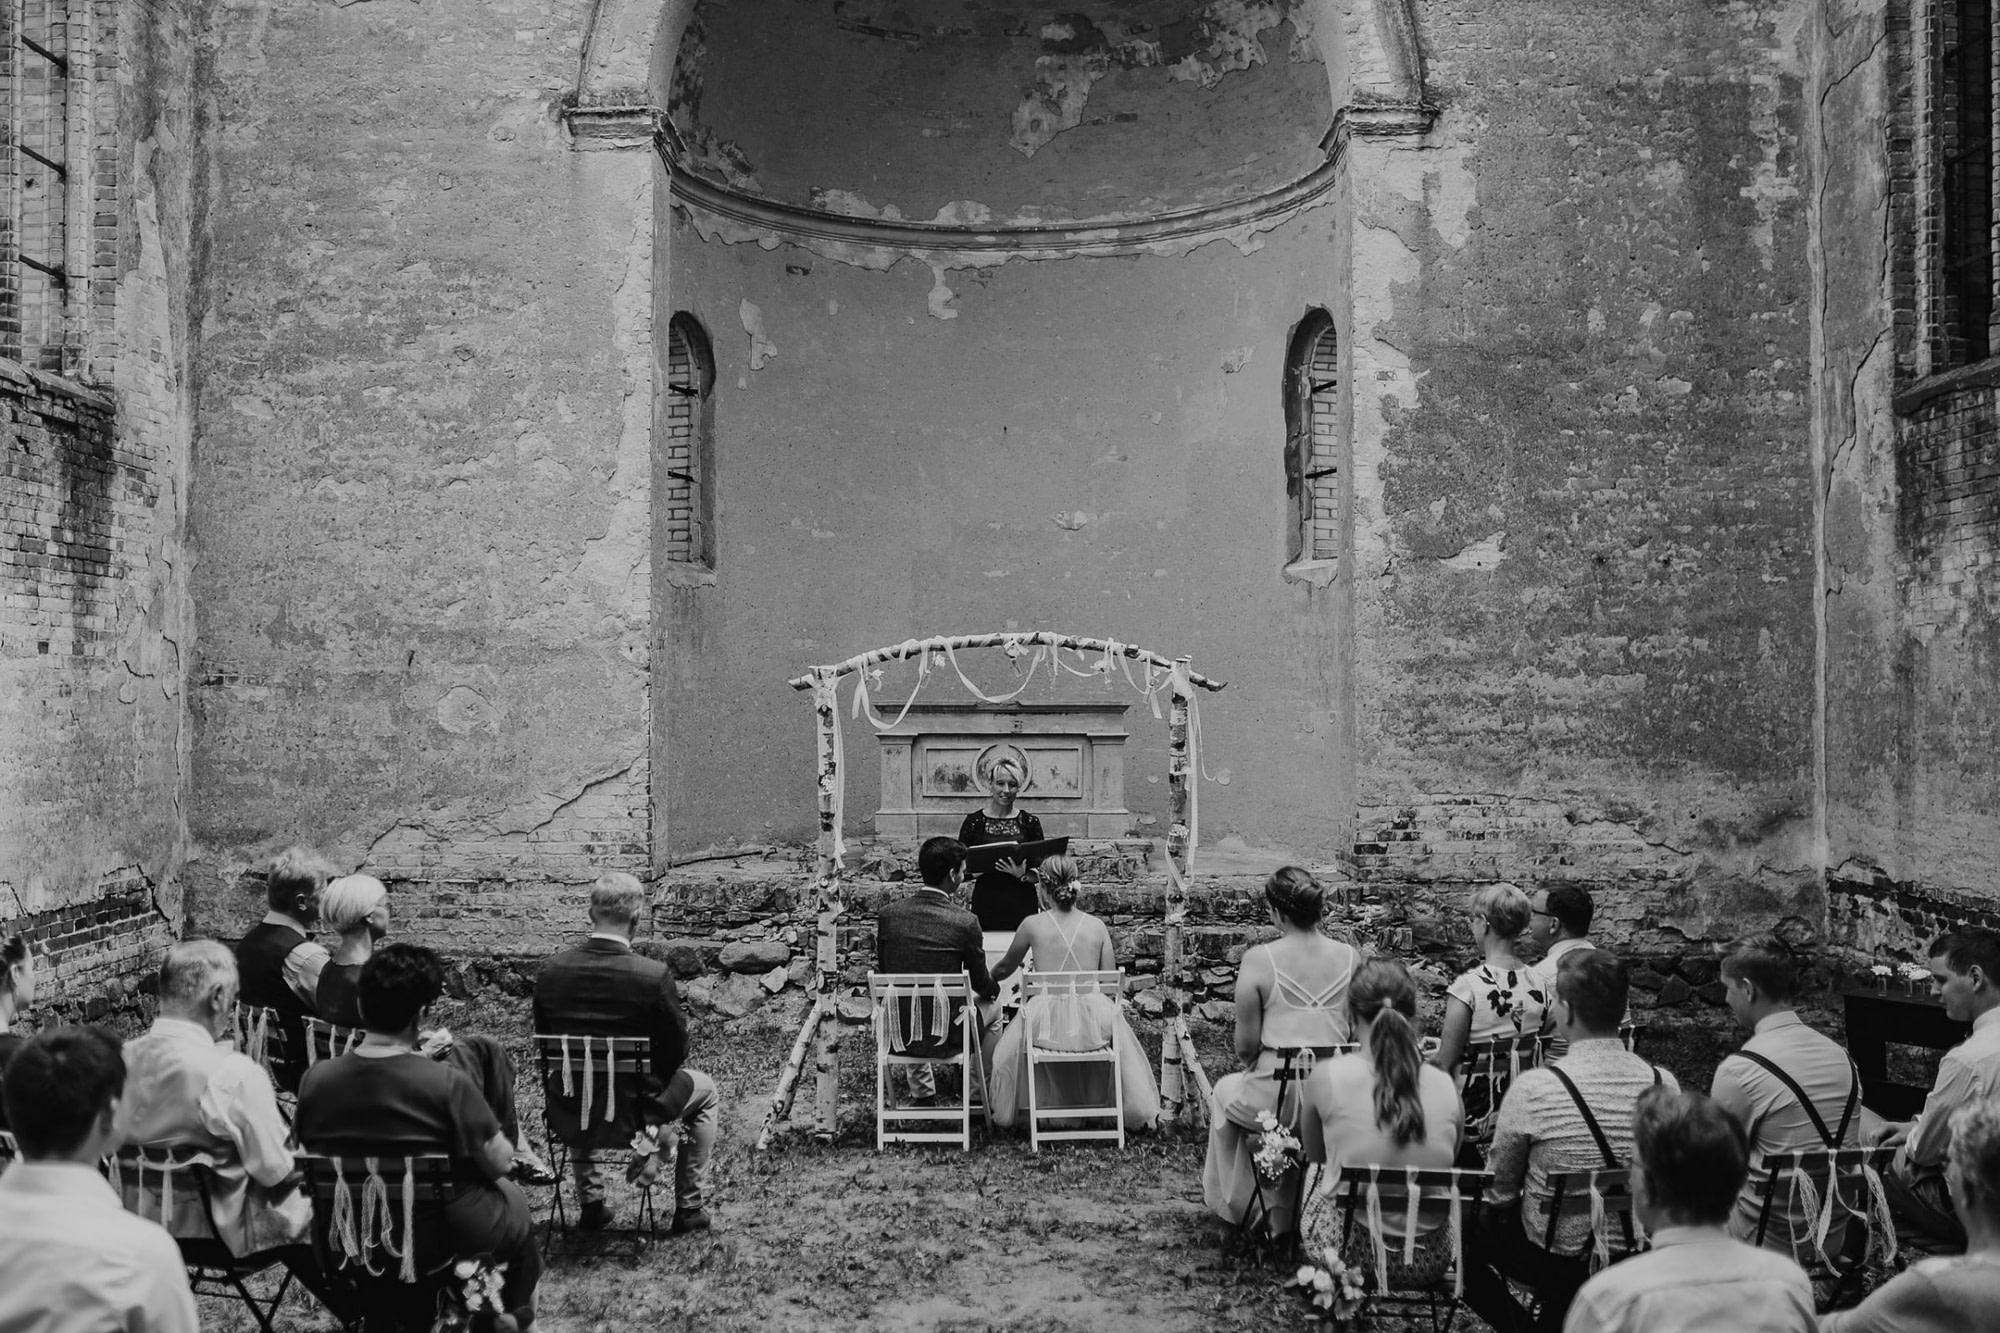 freie trauung, ceremony, standesamtliche trauung,traubogen, wedding arch, boho wedding arch